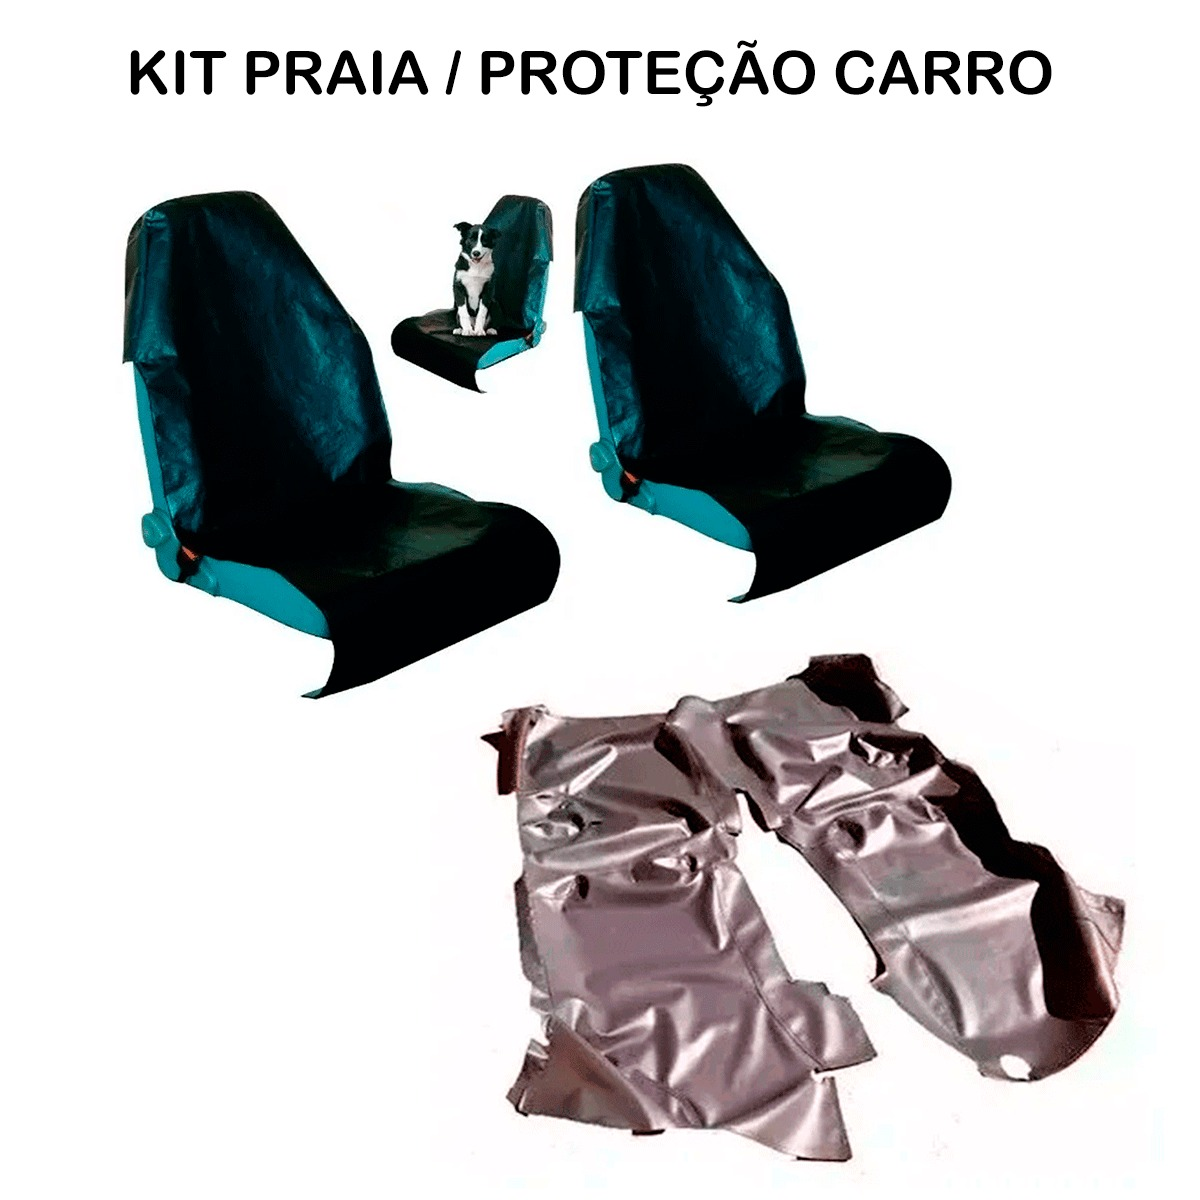 Tapete Em Vinil Ford Courier todos + Capa Banco Protecao Banco Areia Suor Academia